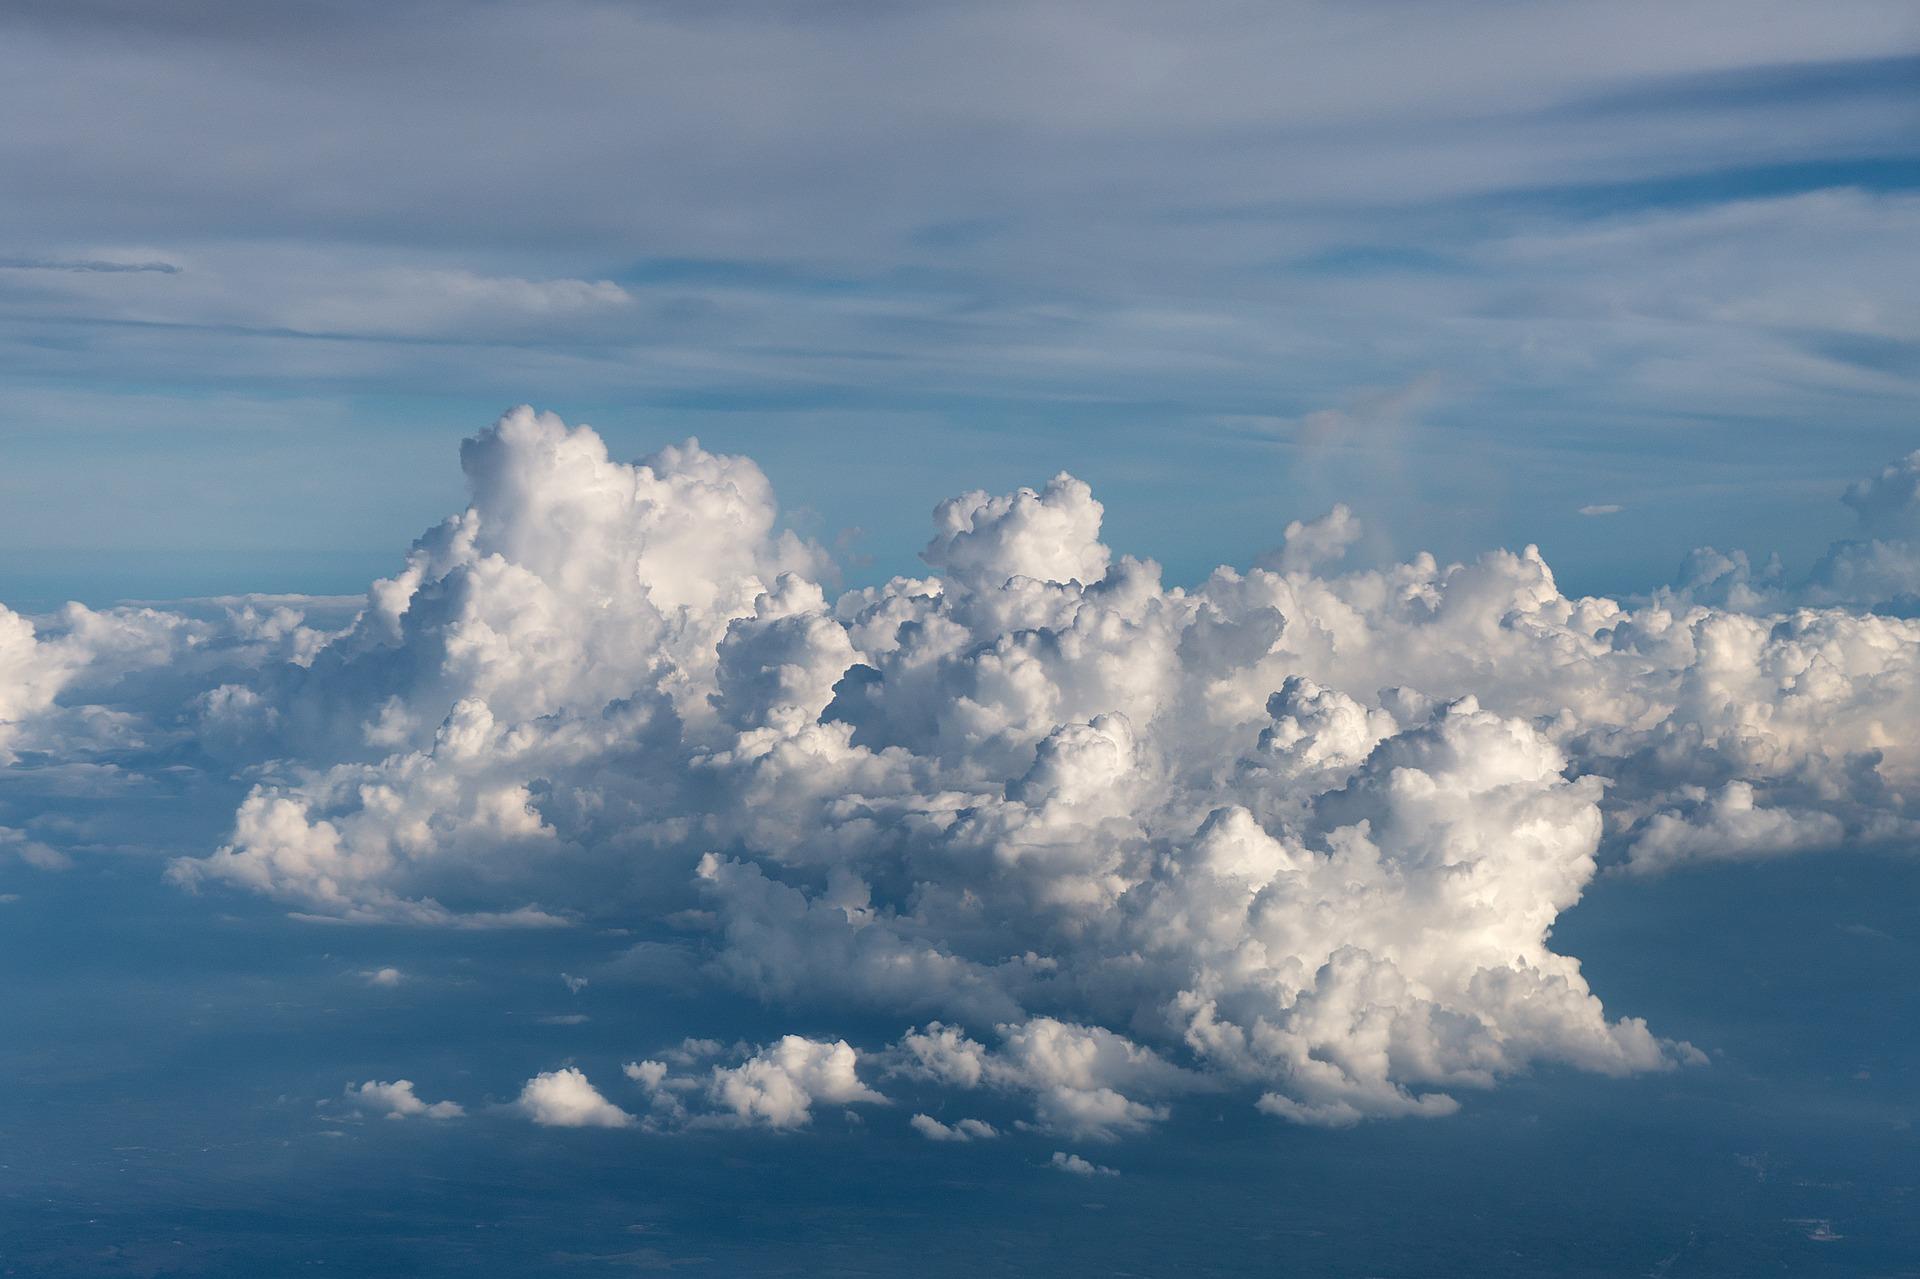 clouds-2085114_1920.jpg